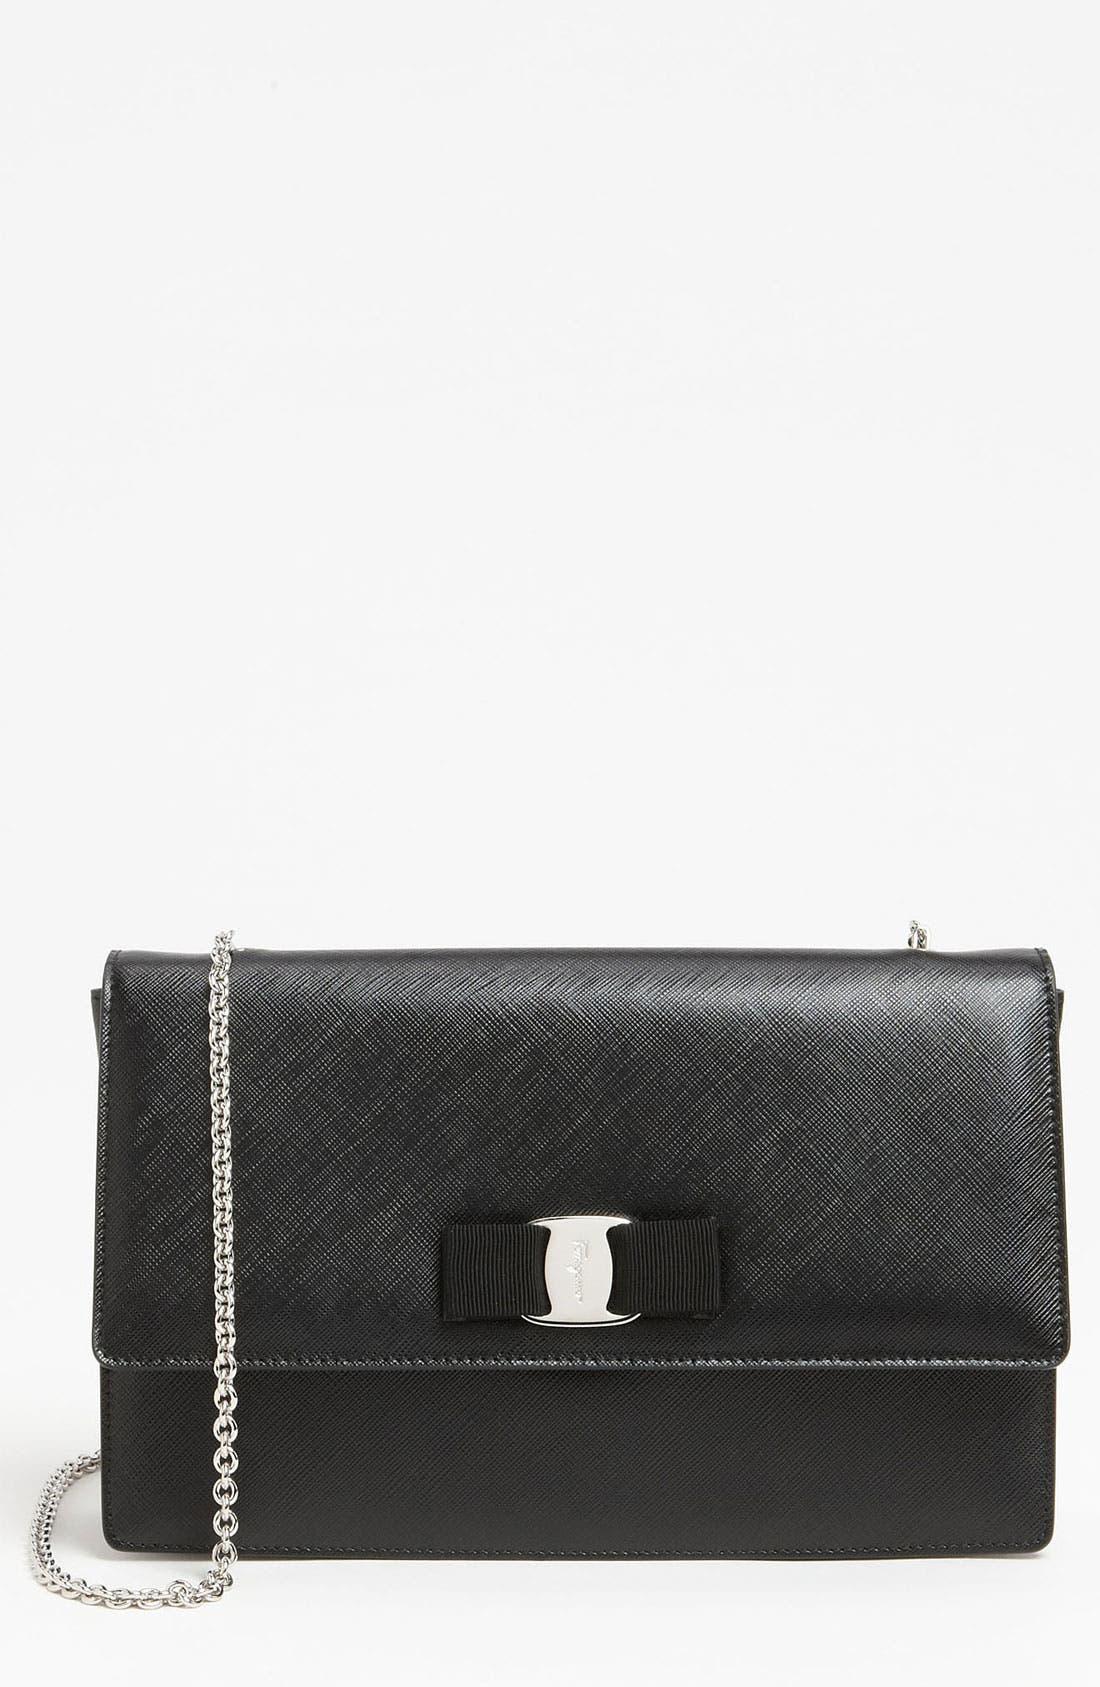 Main Image - Salvatore Ferragamo 'Jimmy' Leather Shoulder Bag